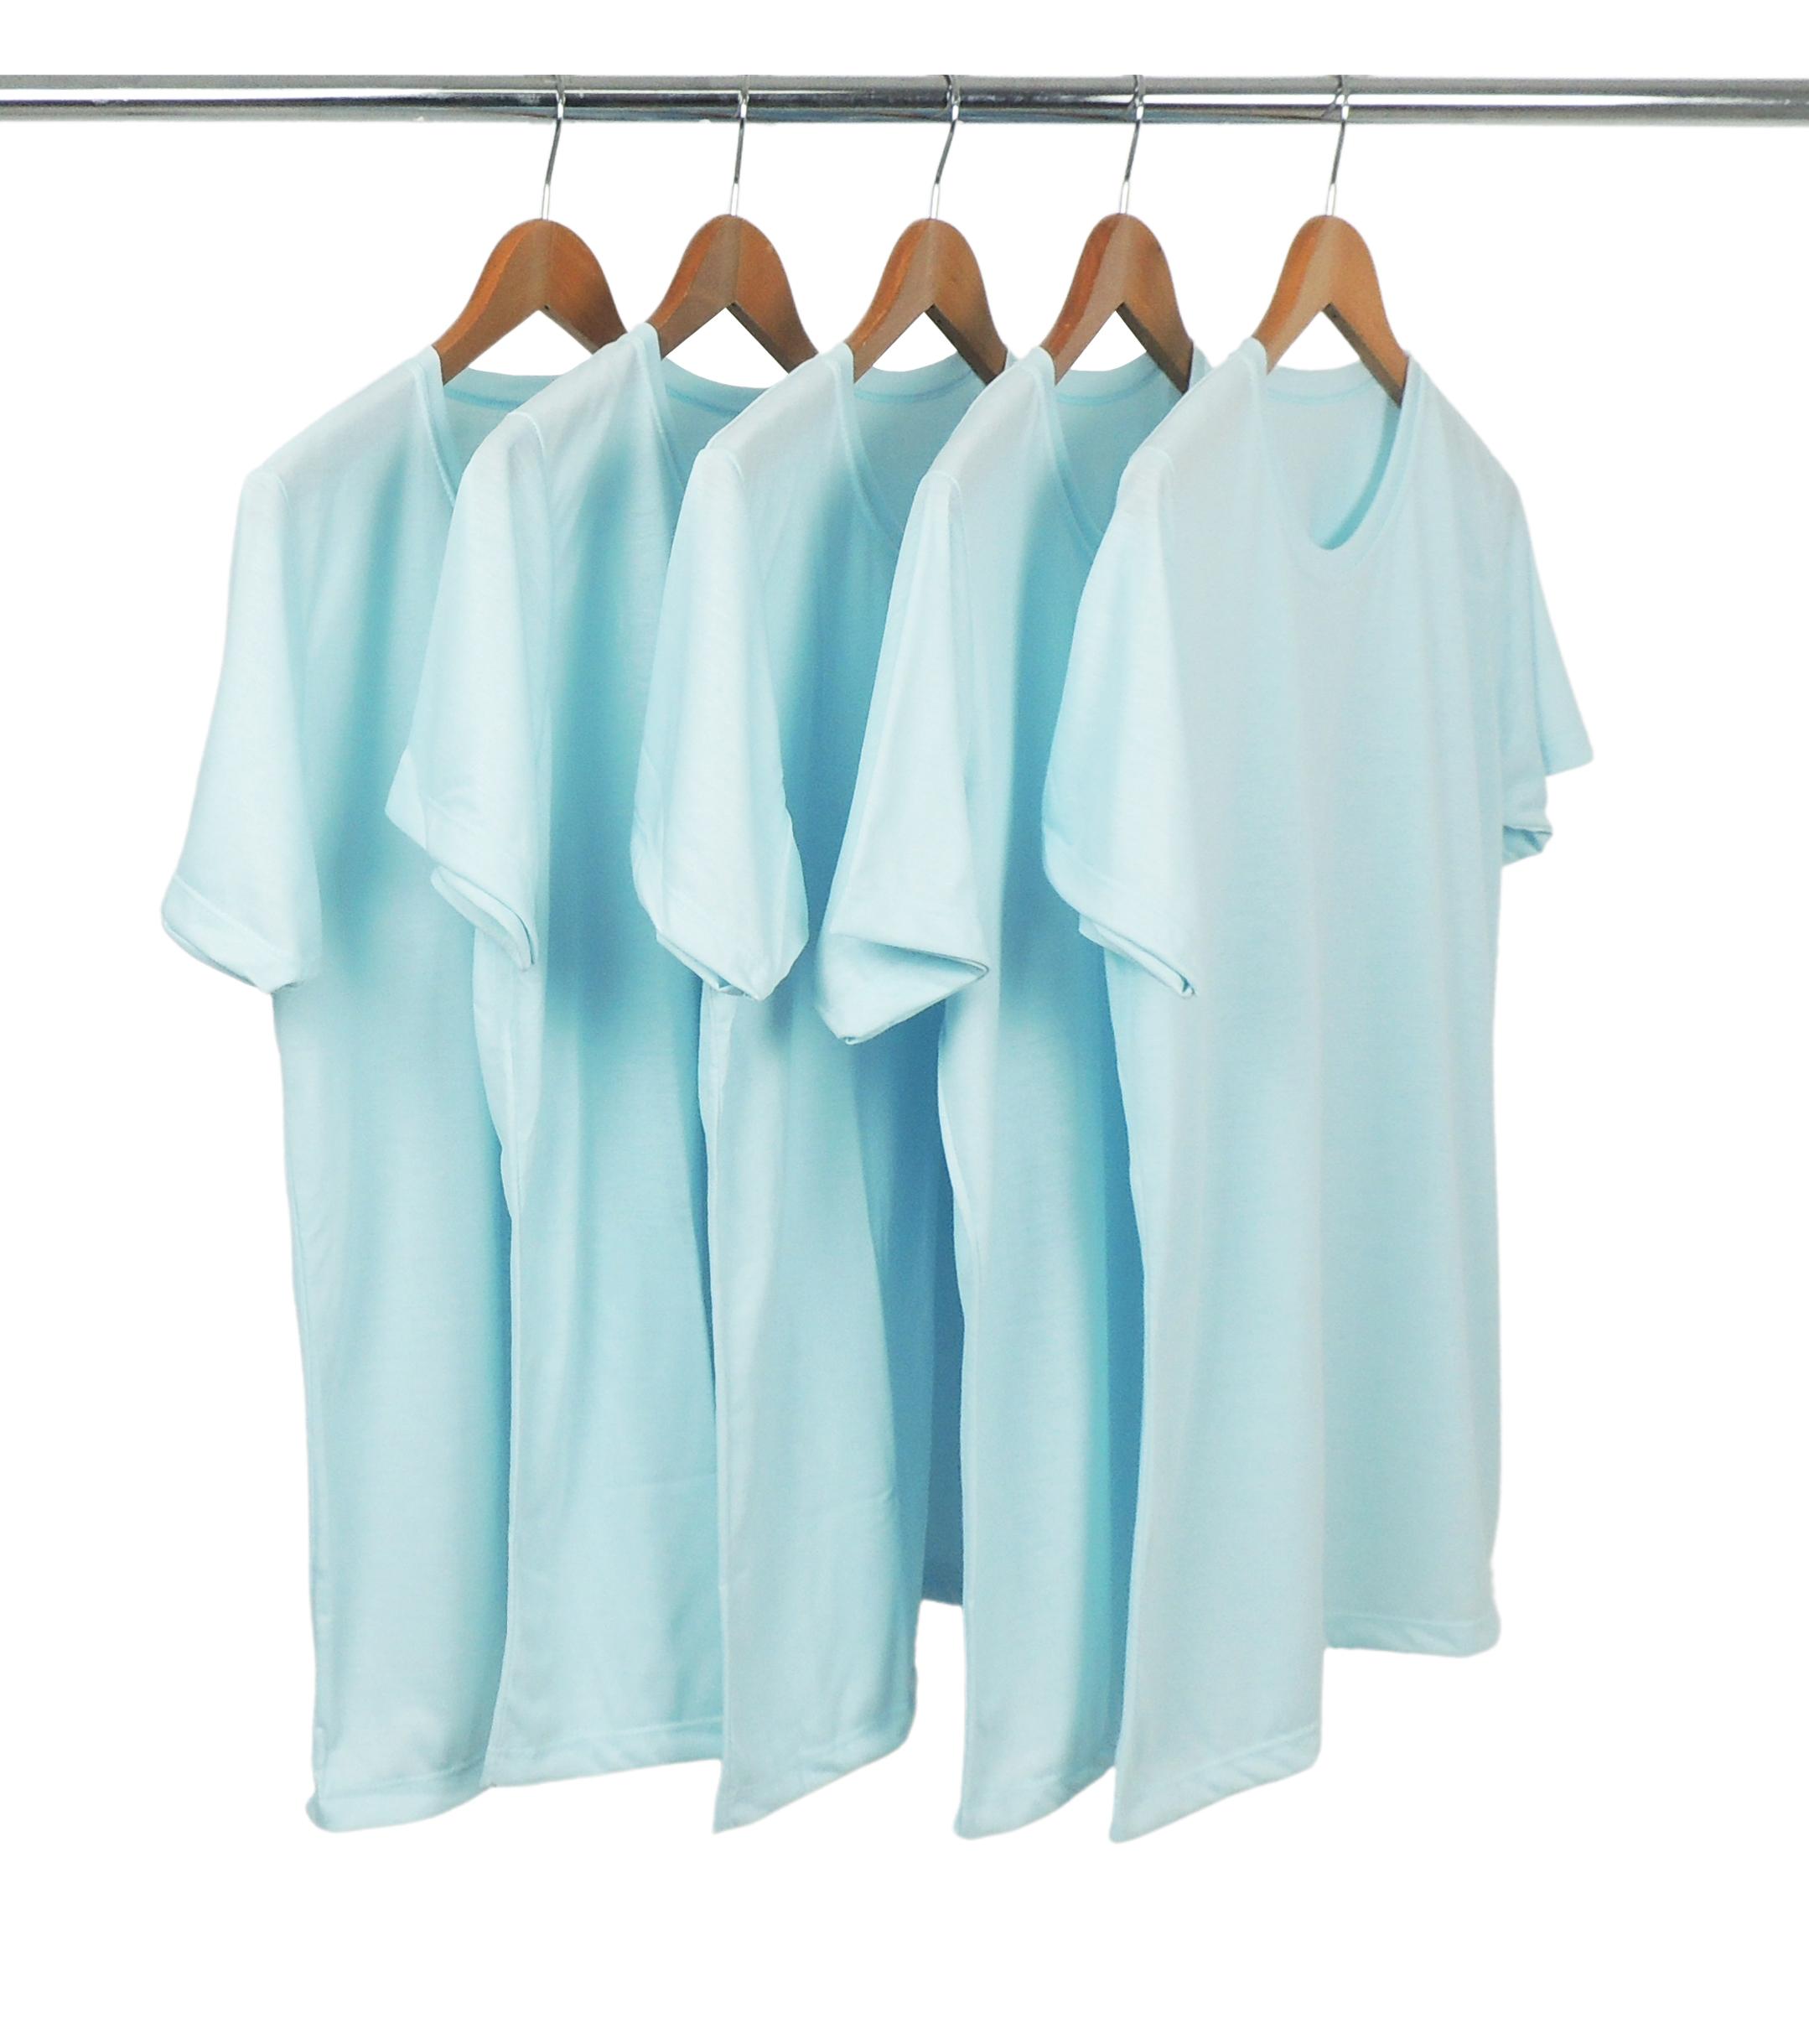 KIT 5 Camisetas de Poliéster/Sublimática Azul Bebê